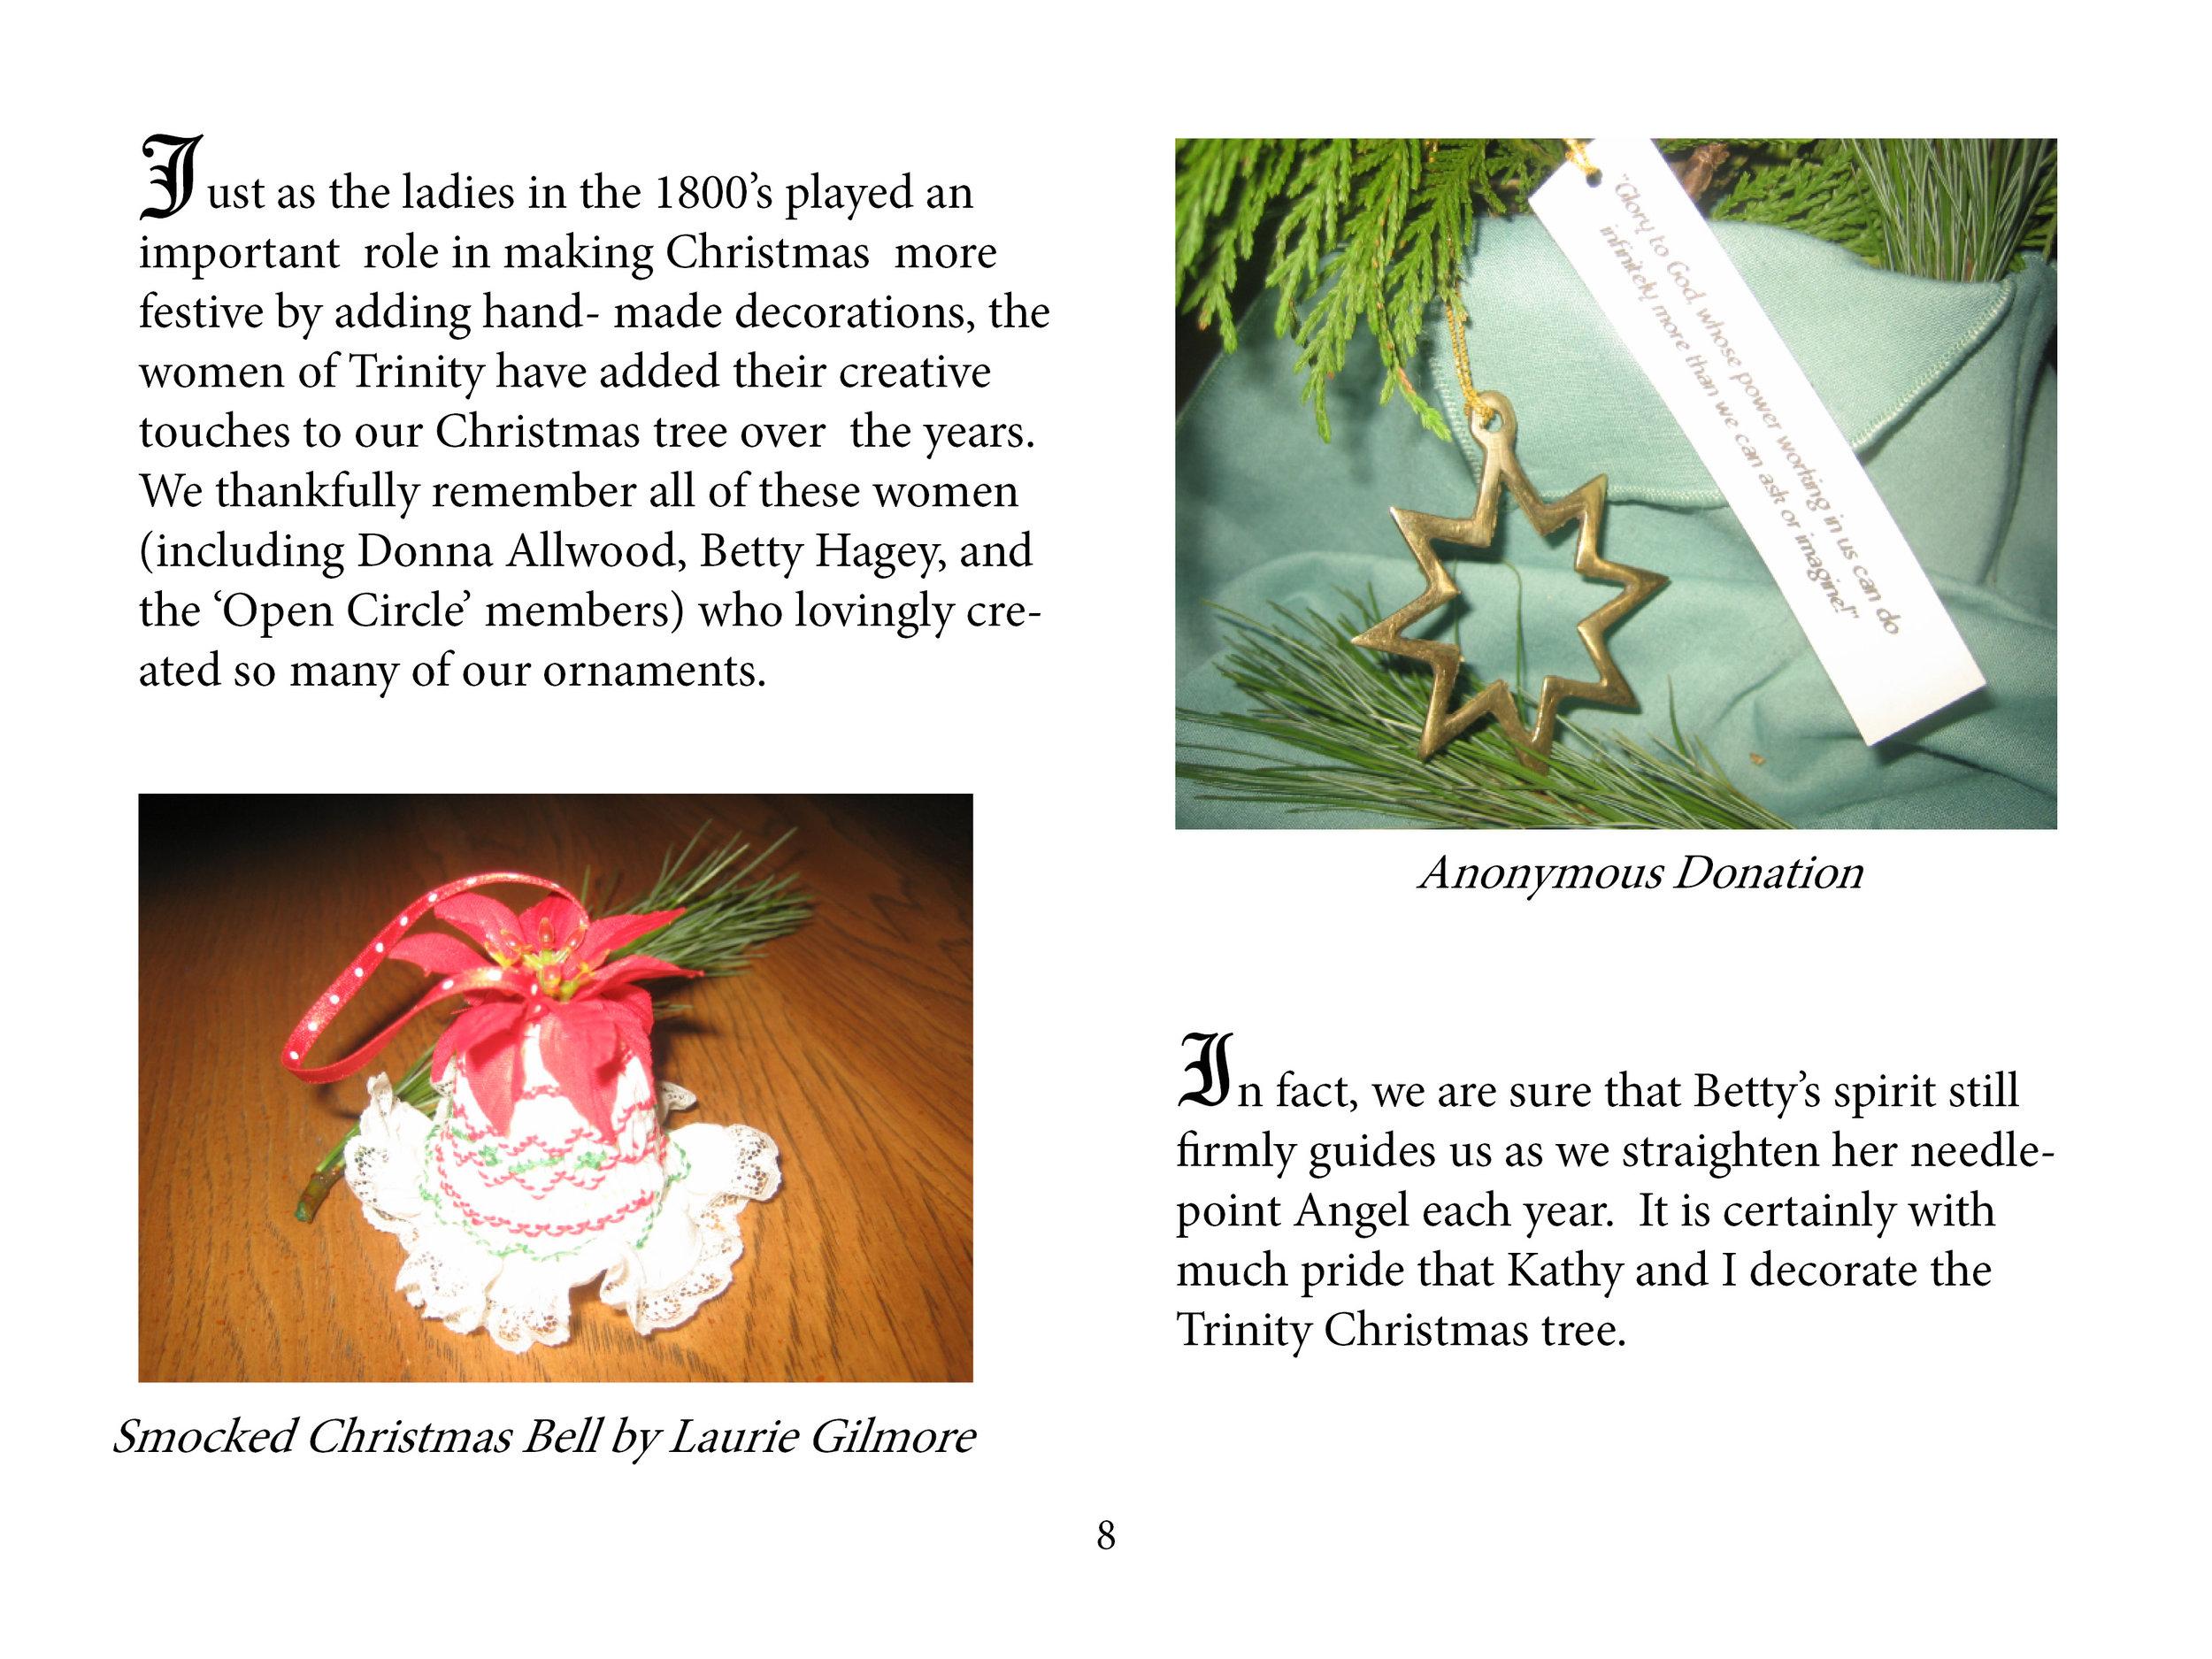 Trinity Christmas Tree Online Page 8.jpg